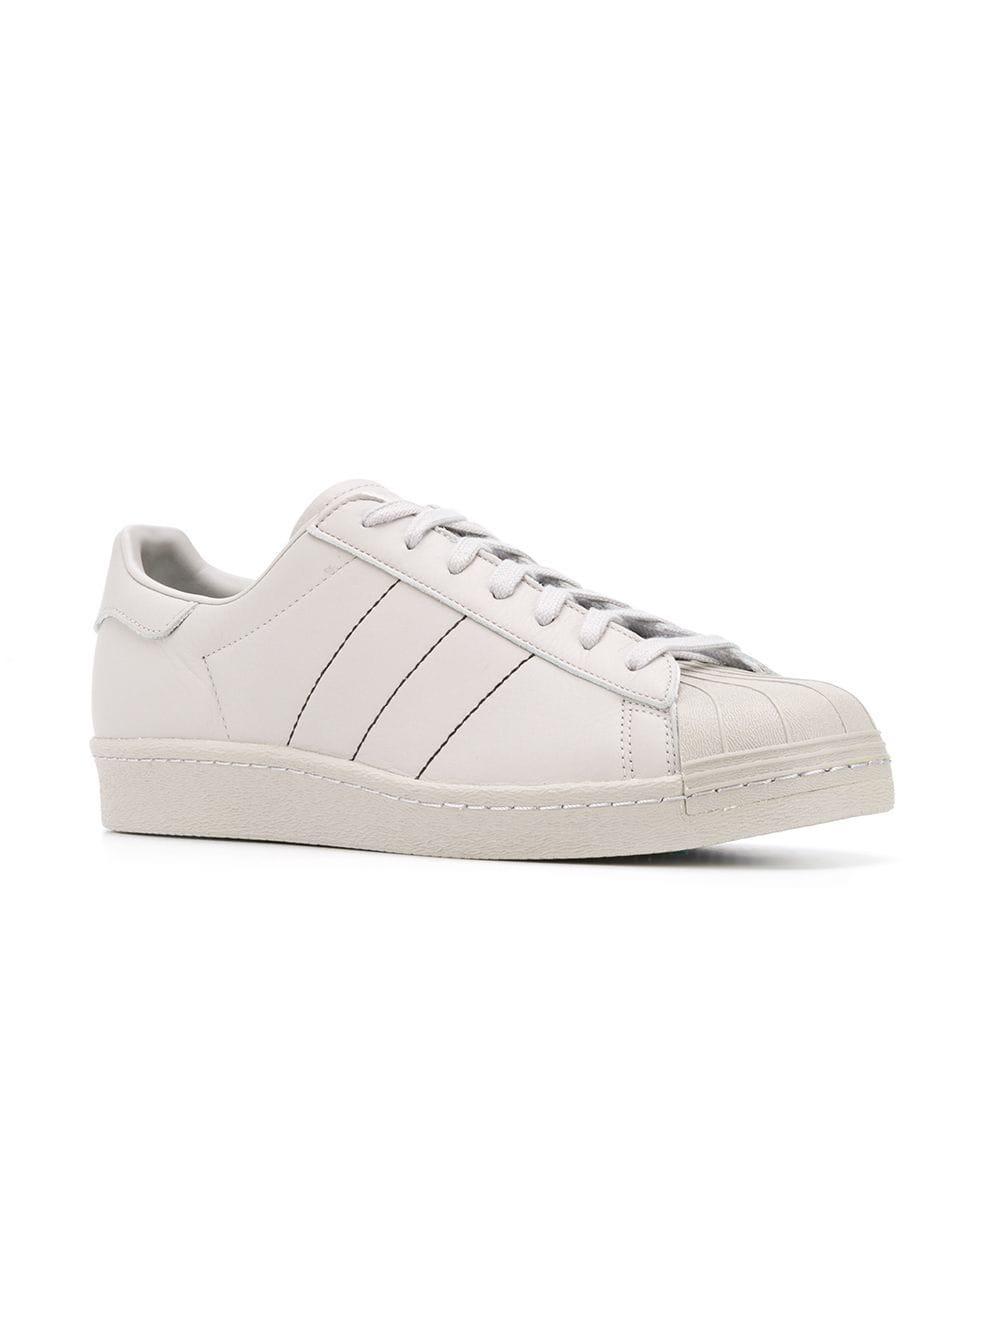 bebb3a7ab99ee Adidas - Gray Originals Superstar Sneakers for Men - Lyst. View fullscreen